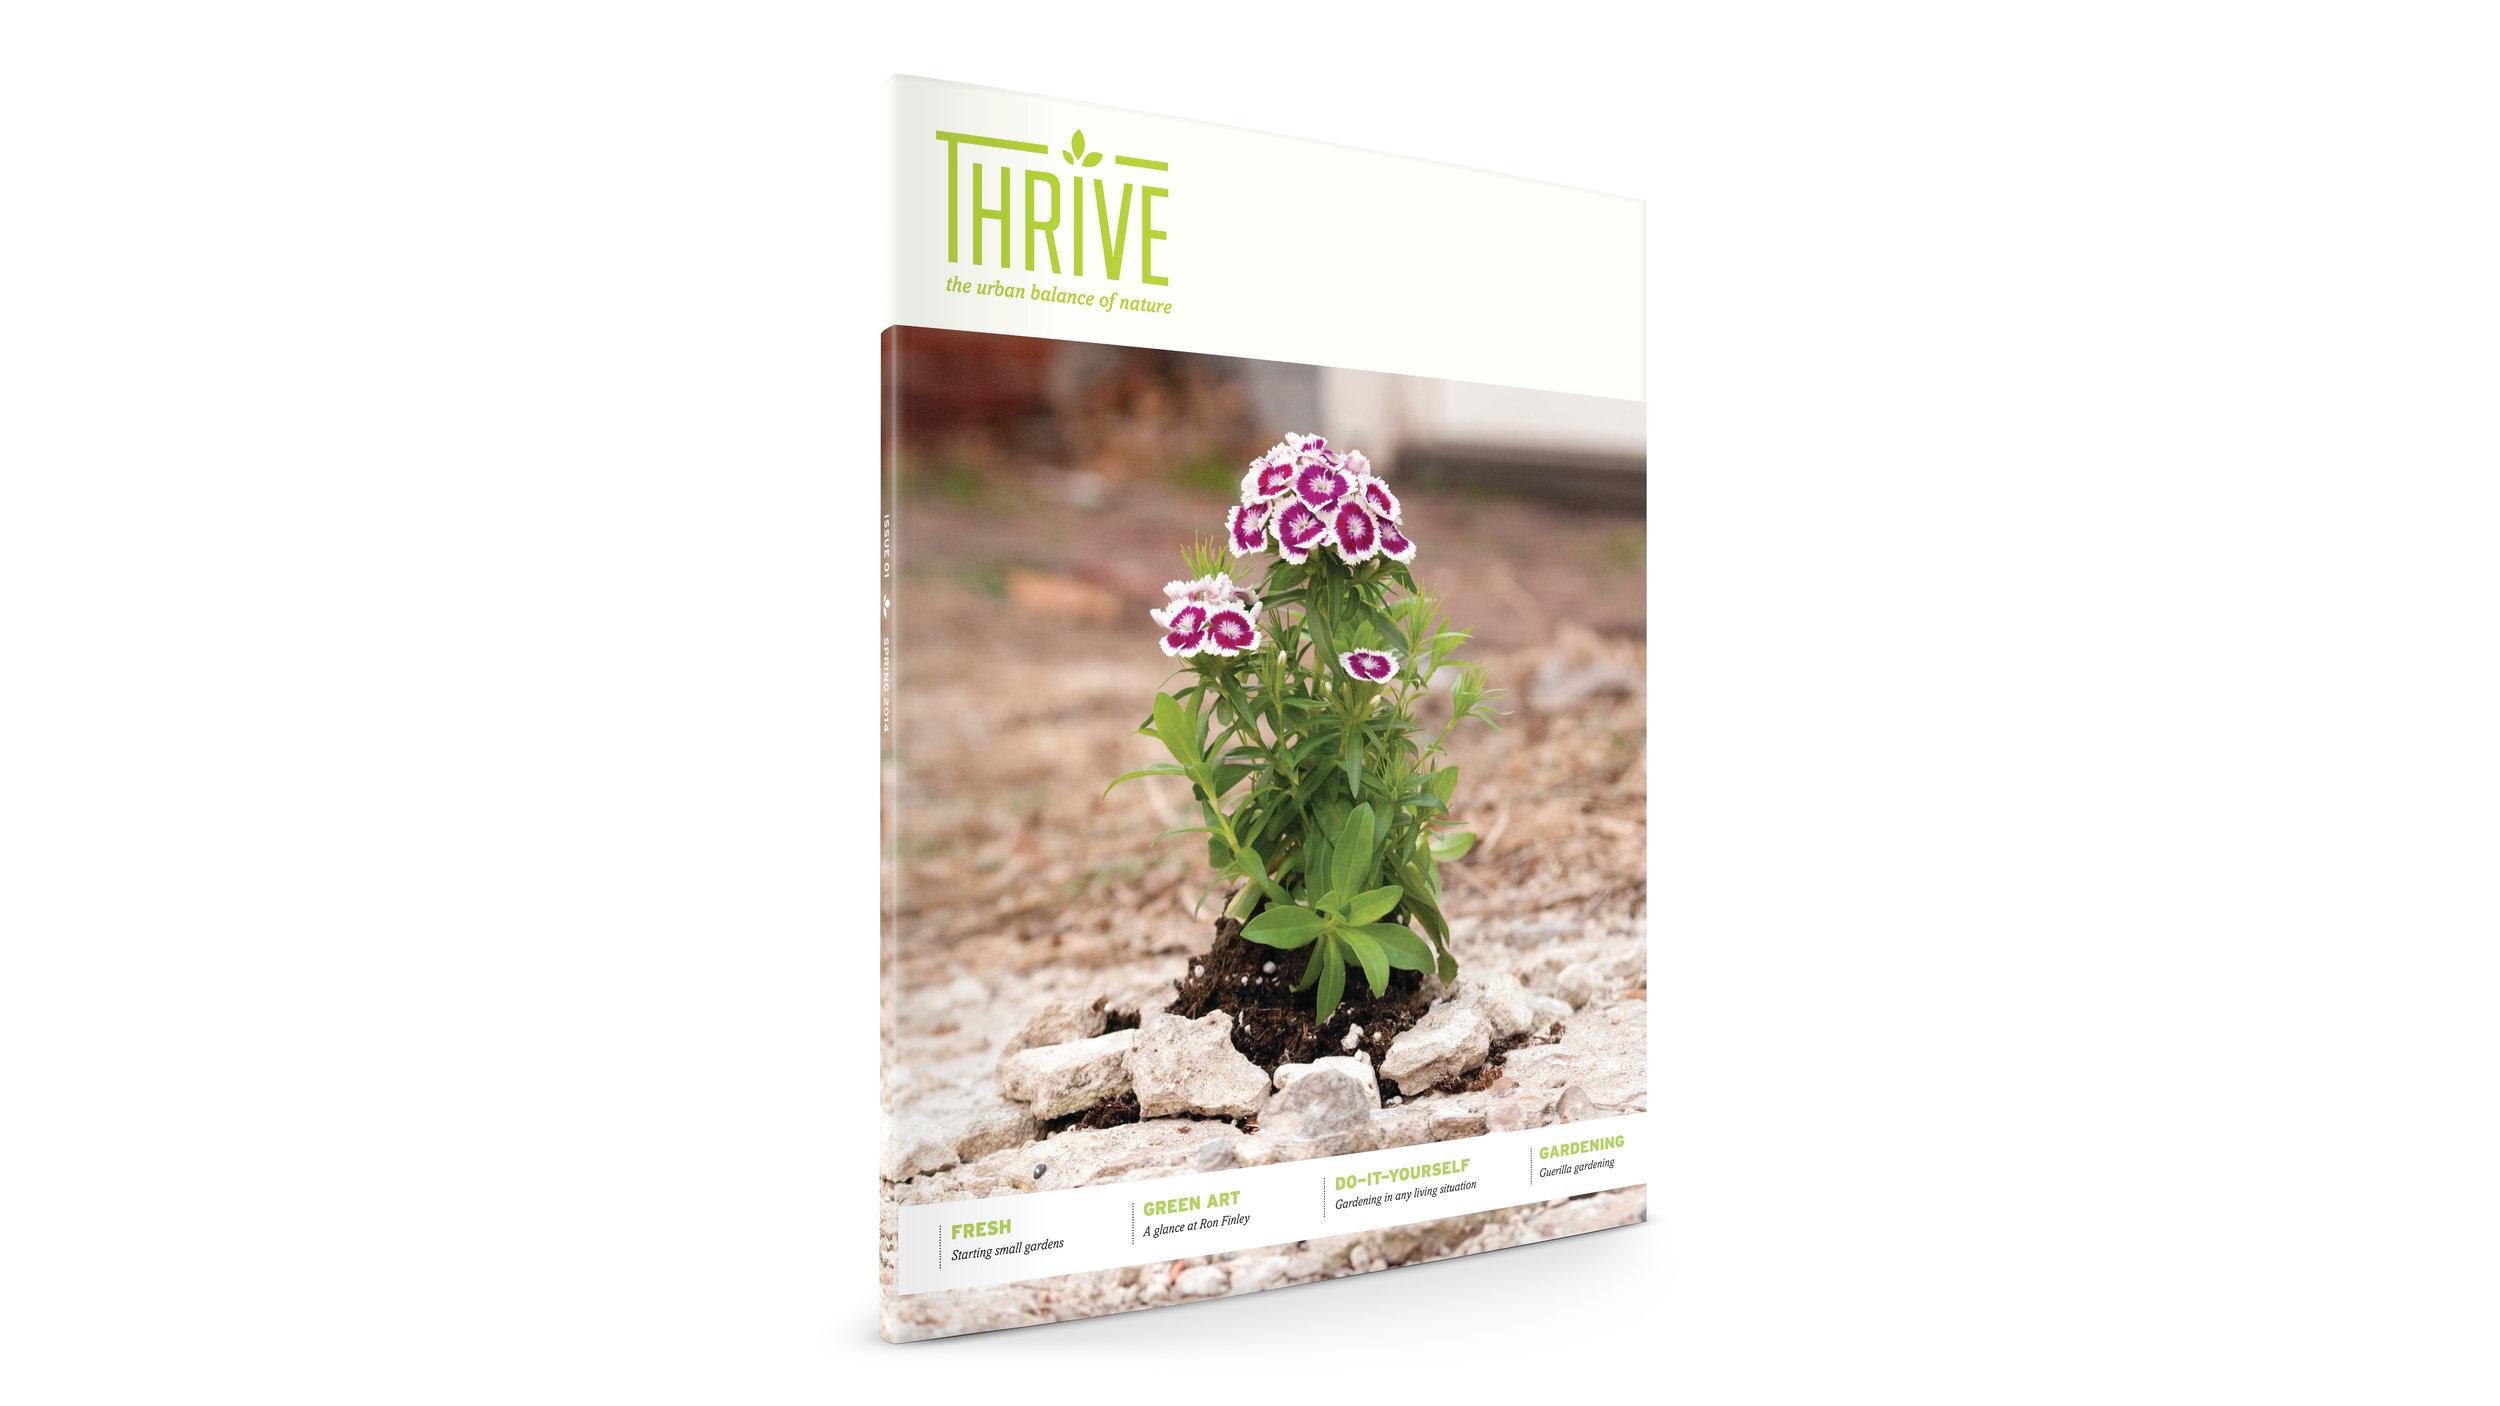 Thrive_sqspc2.jpg